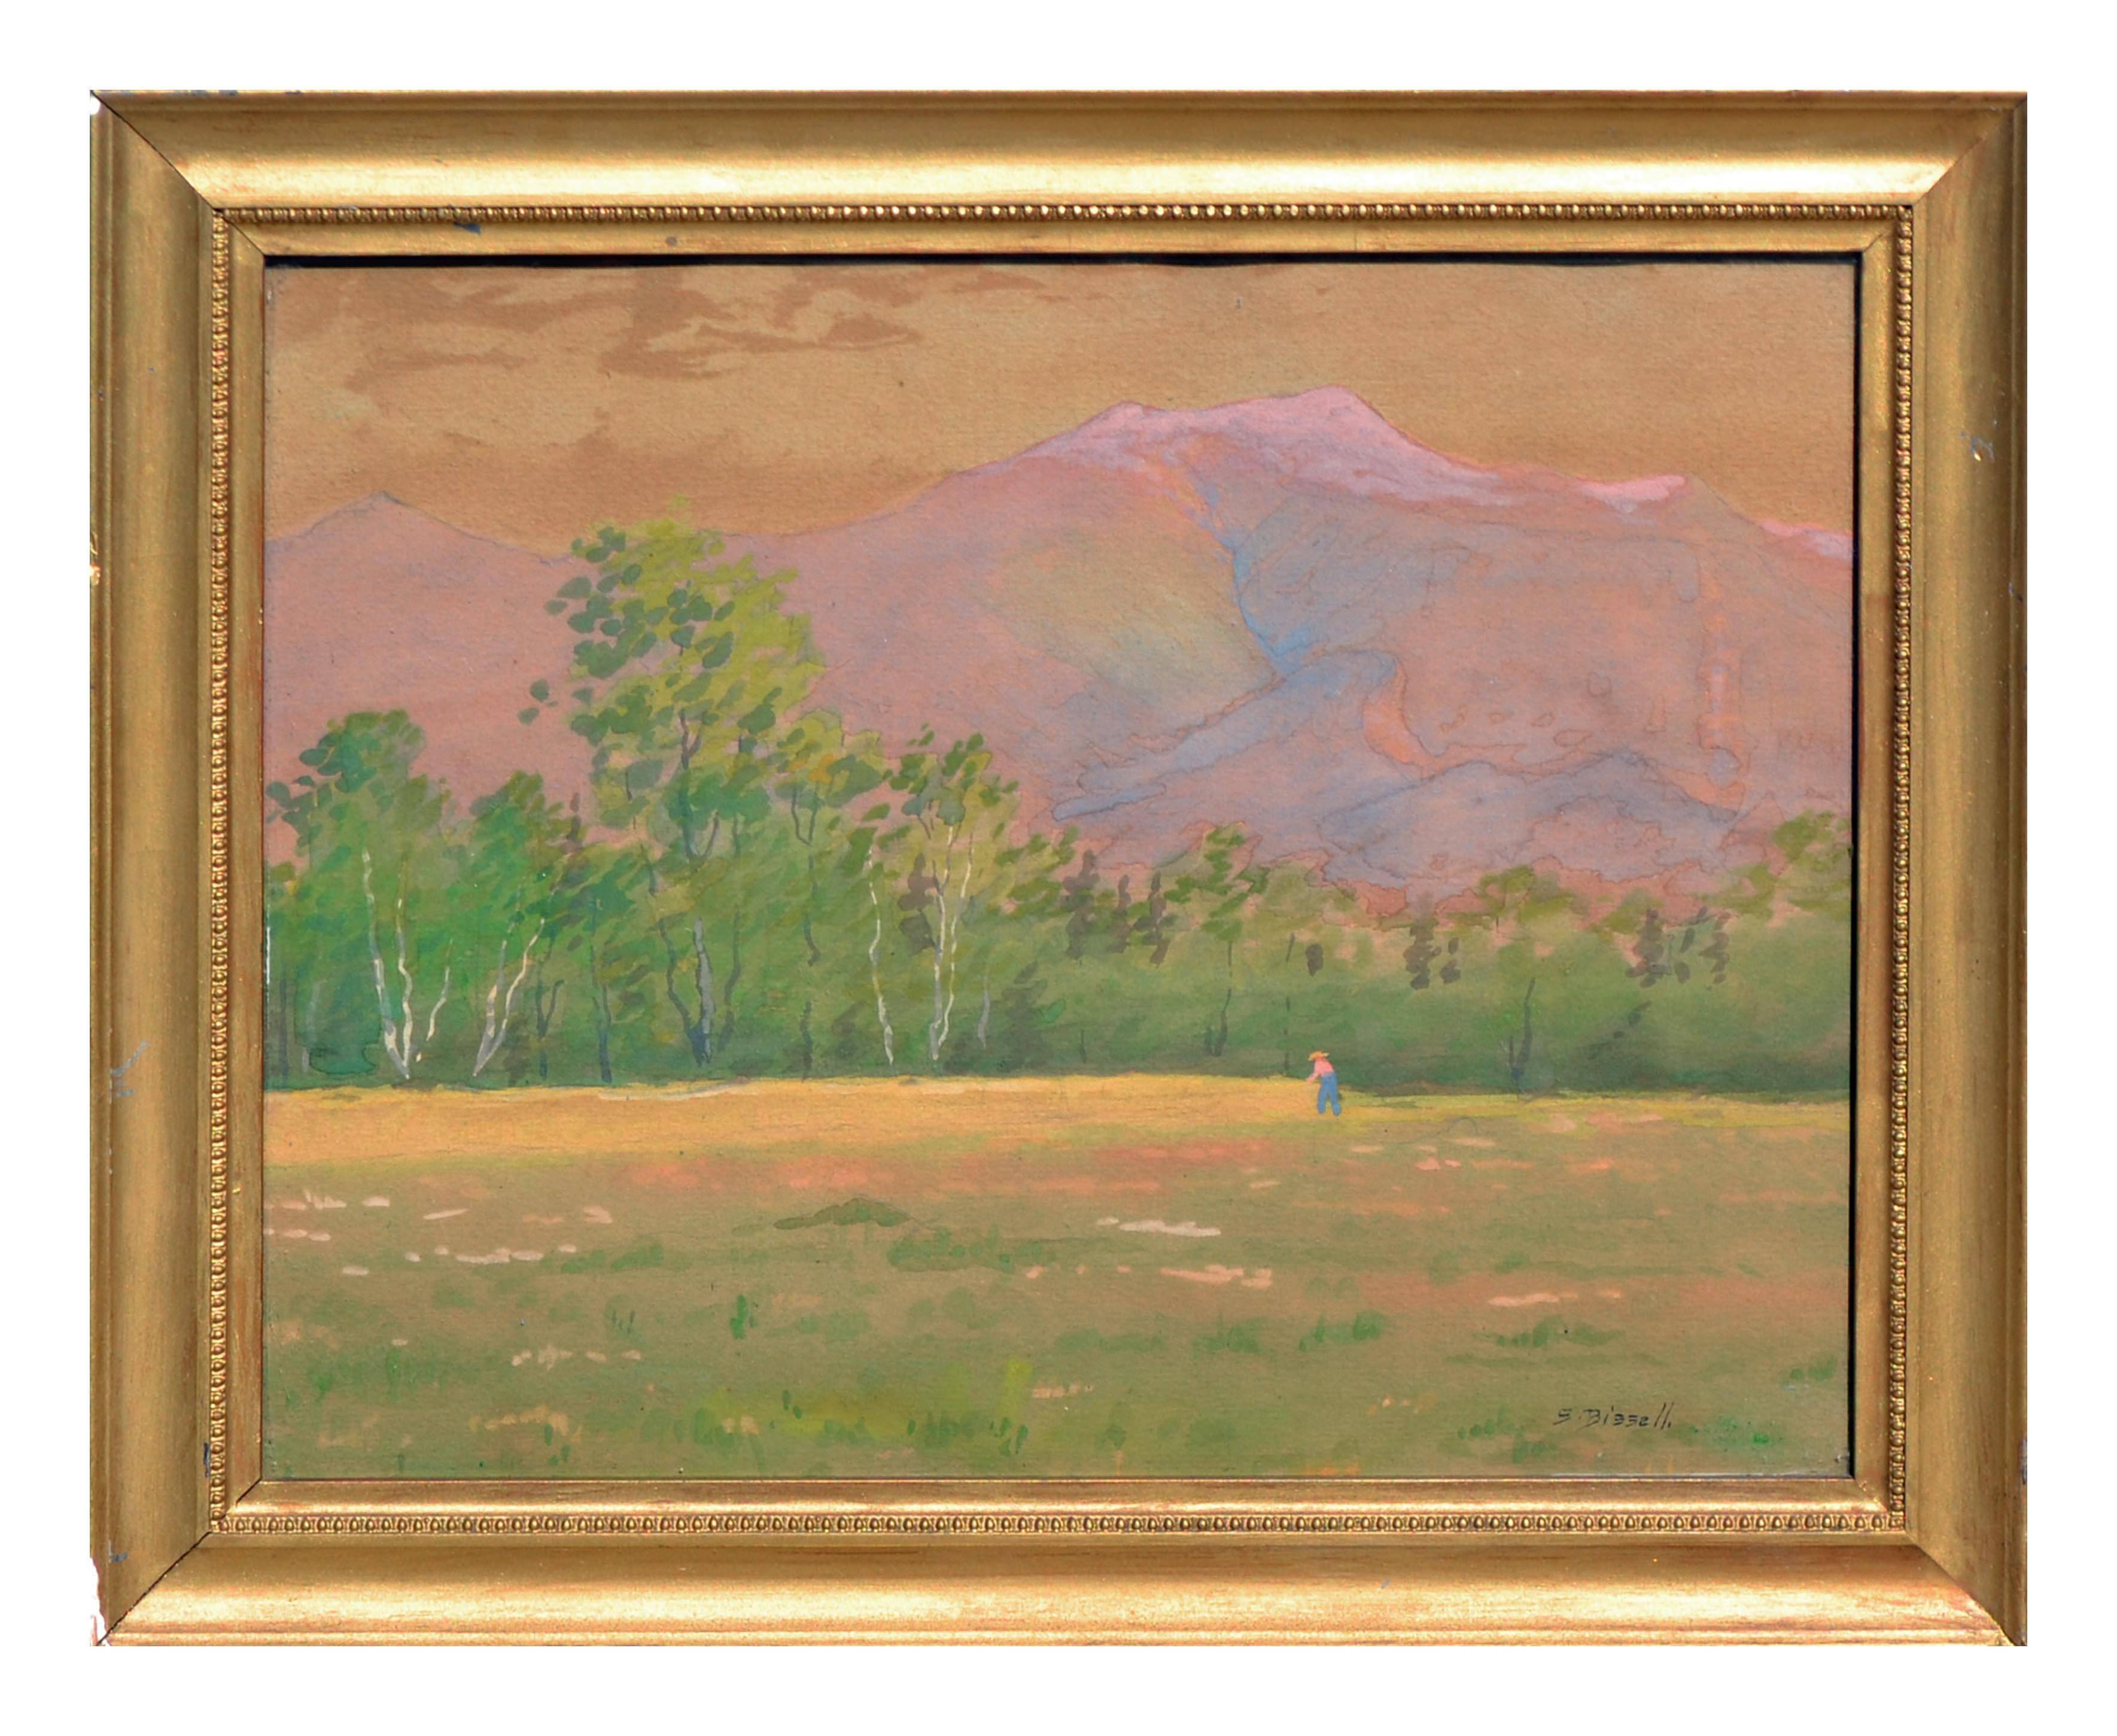 Late 19th Century Adirondack Mountains, New York Landscape